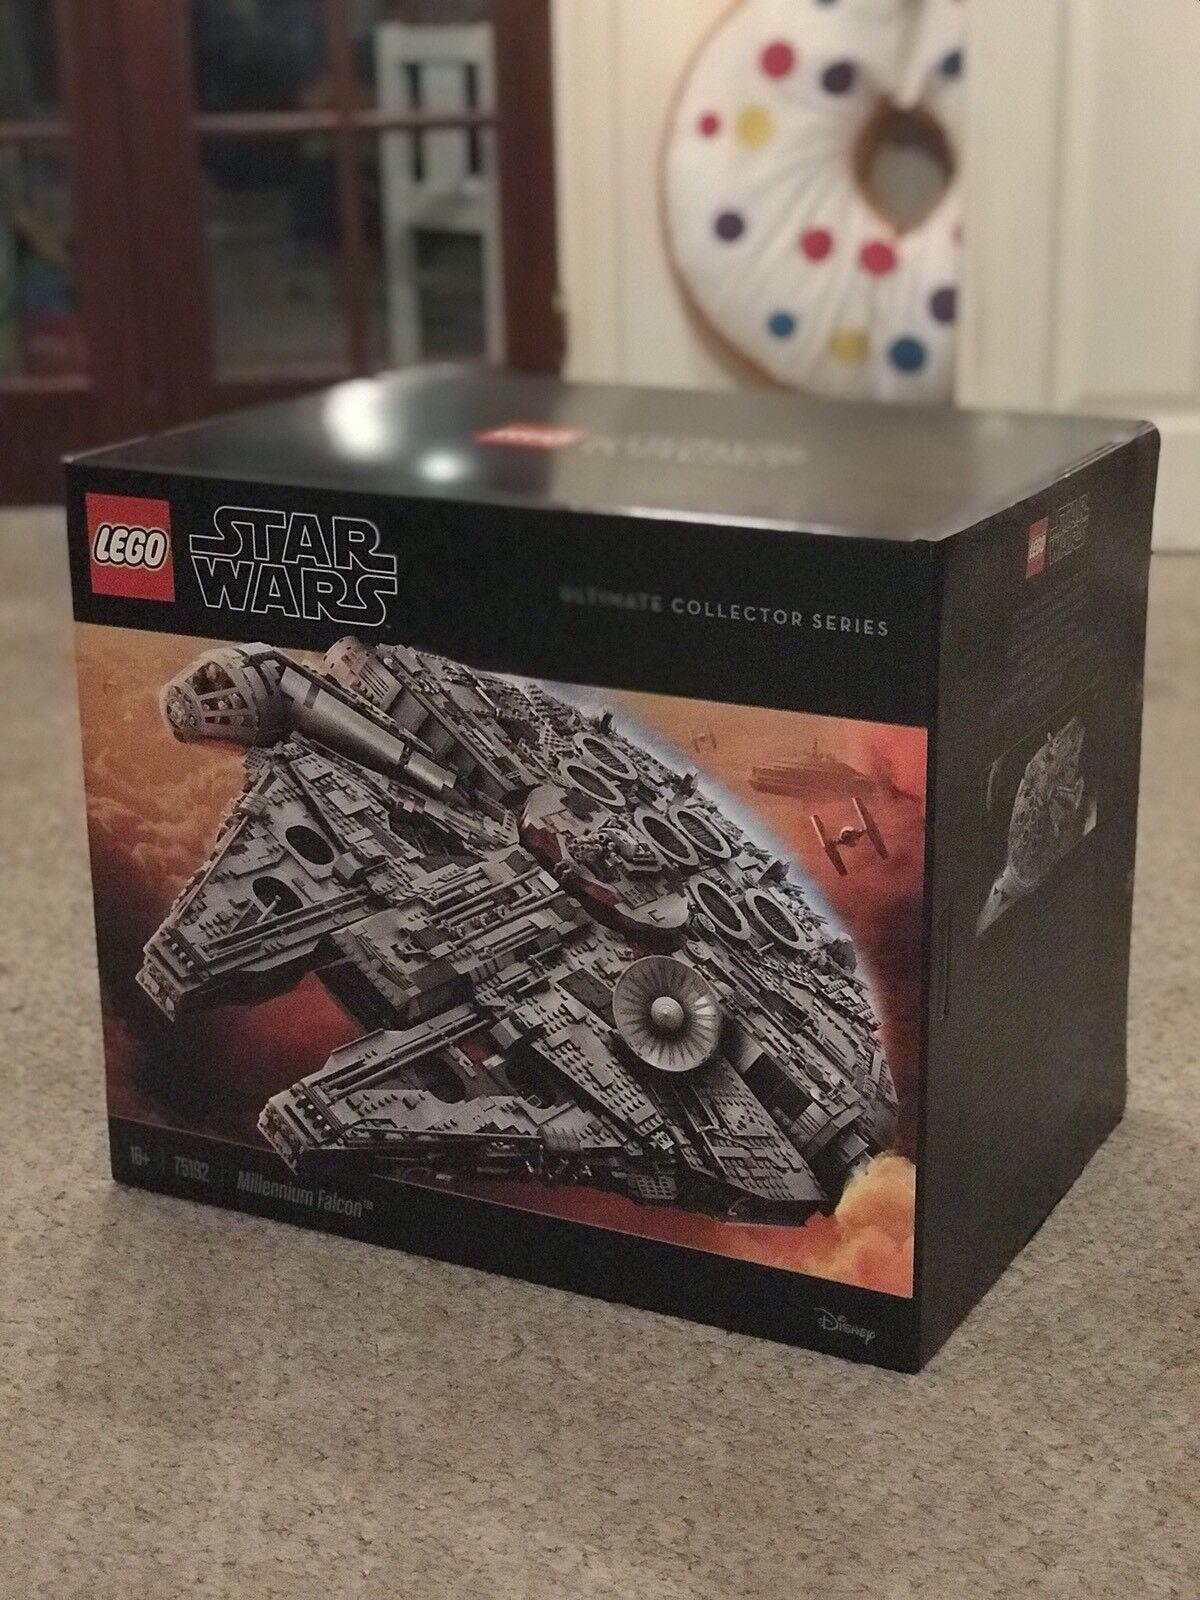 NEUF LEGO Star Wars UCS Millennium Falcon 75192 Très Rare  Non Ouvert